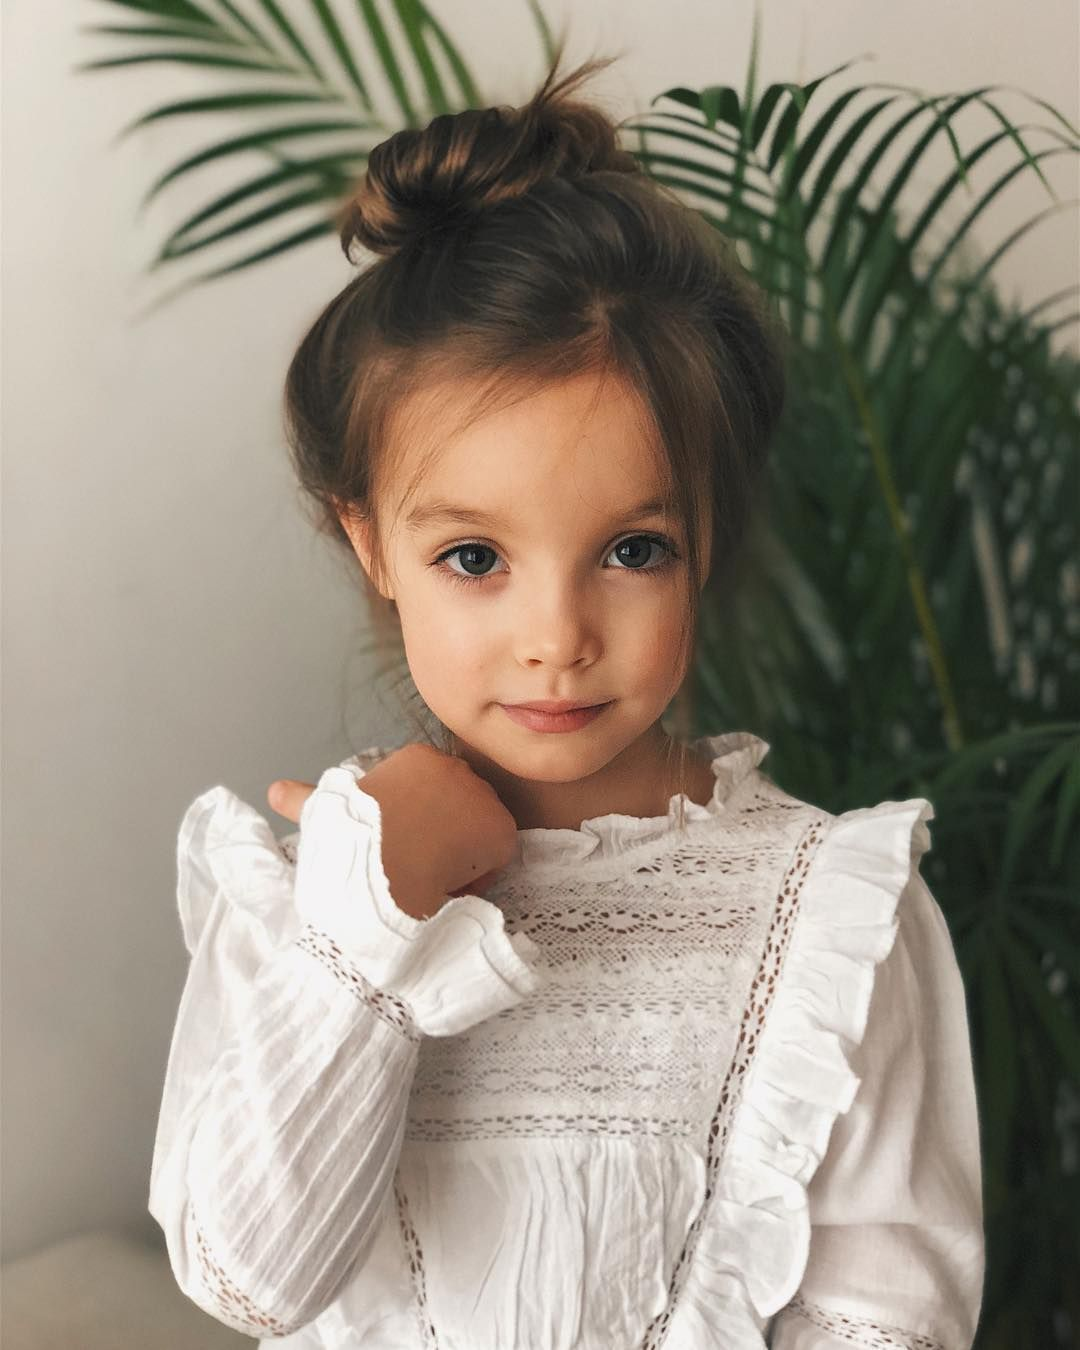 Pin Ot Polzovatelya Leia Amorelli Na Doske Kids Fashion Modnye